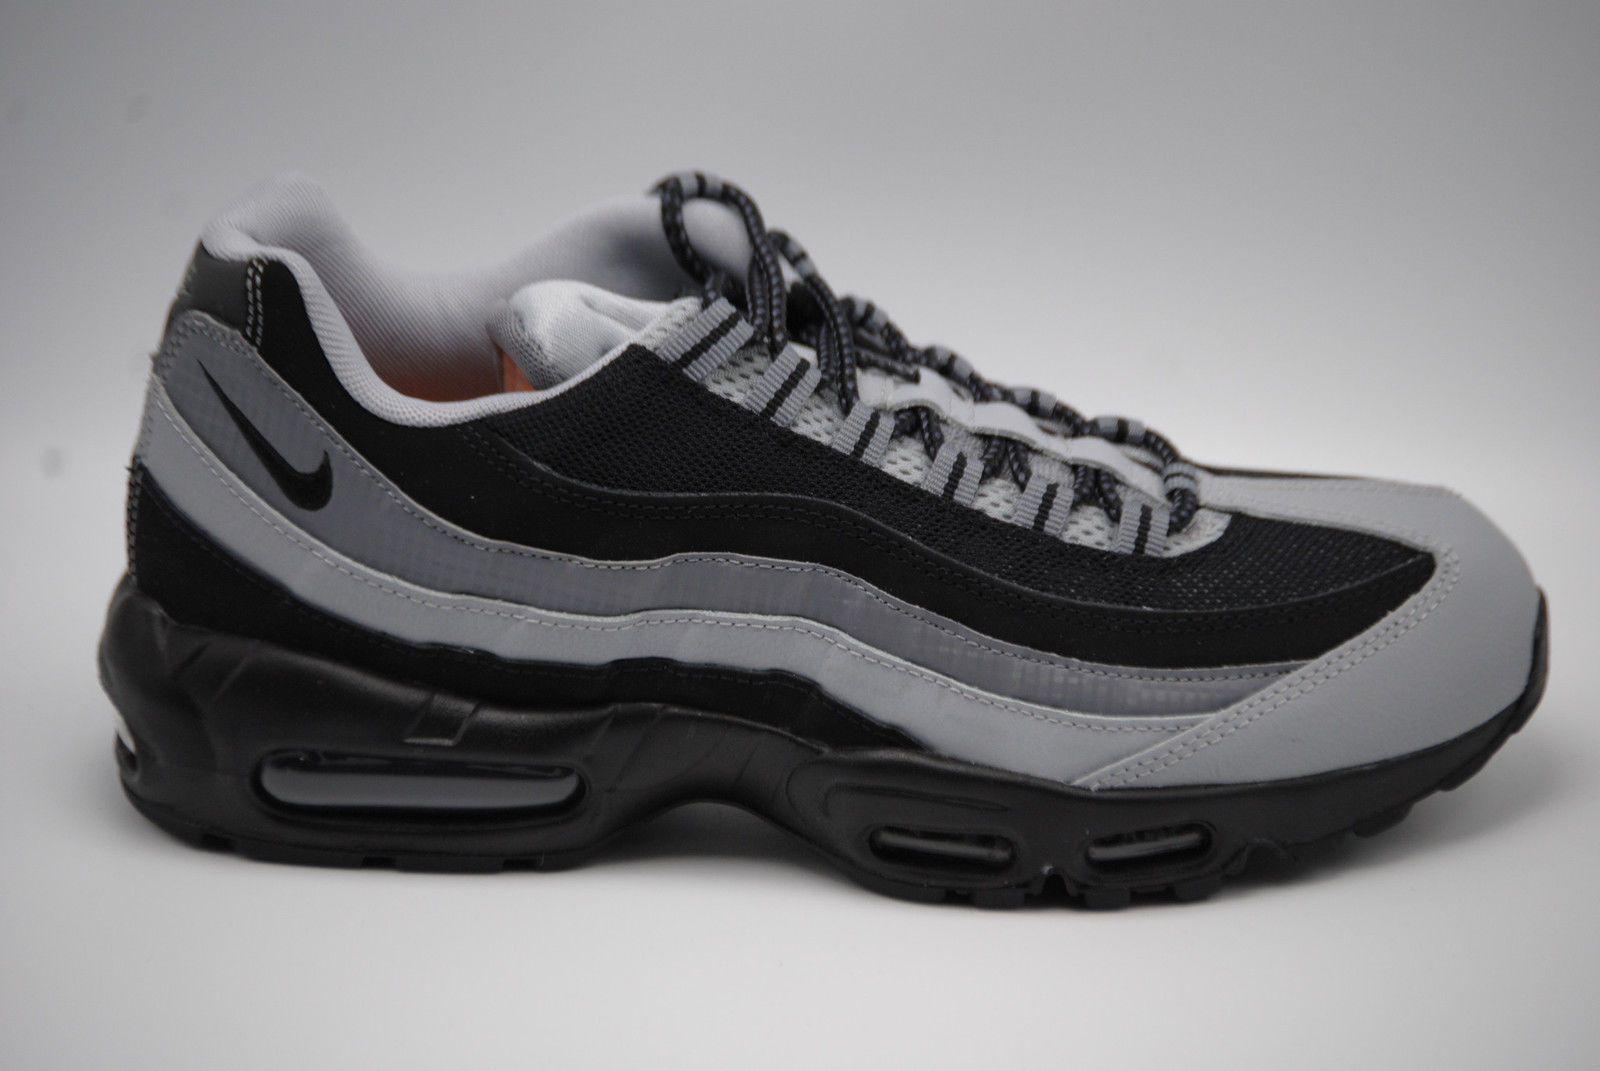 hot sale online 3666e c50b6 Nike Air Max 95 Essential Men S Sneakers 749766 005 Multiple Sizes